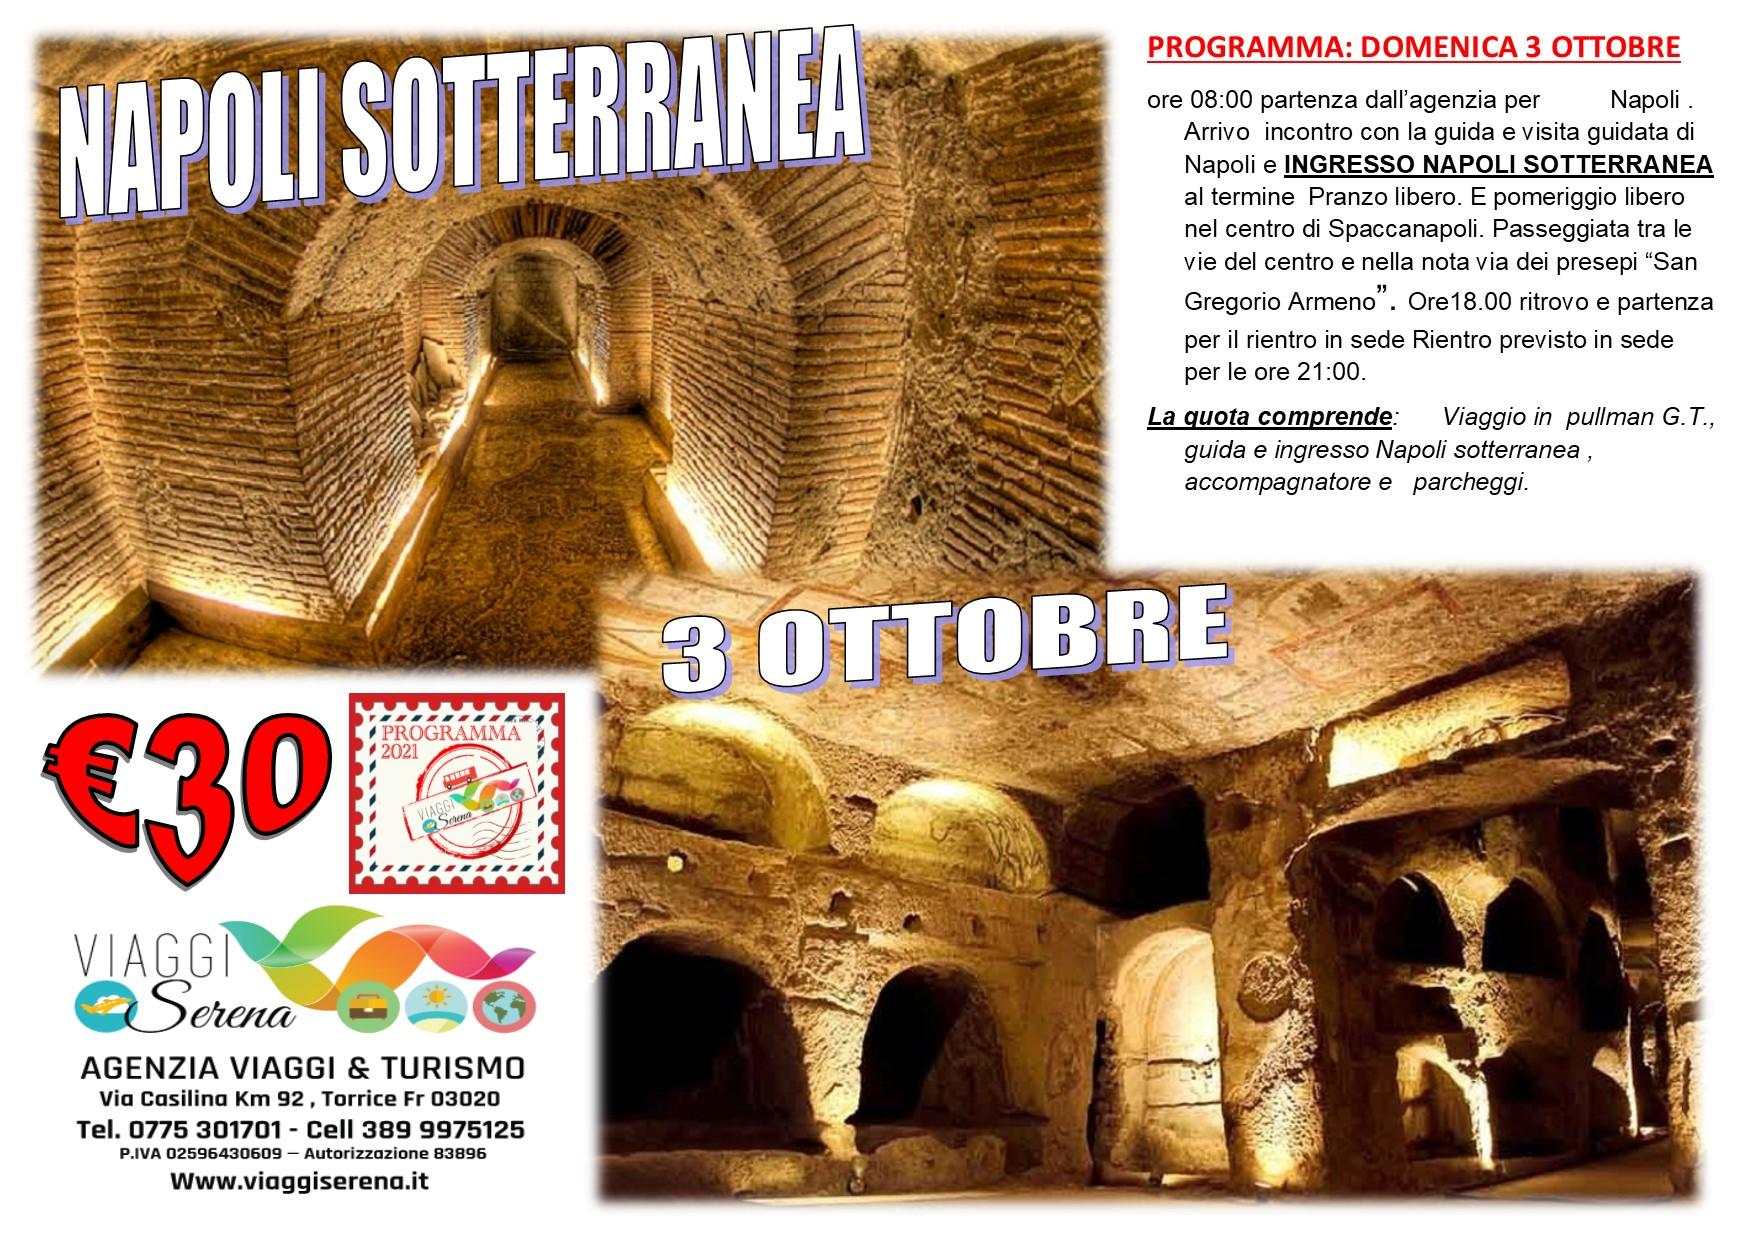 Viaggi di Gruppo: Napoli Sotterranea 3 Ottobre € 30,00